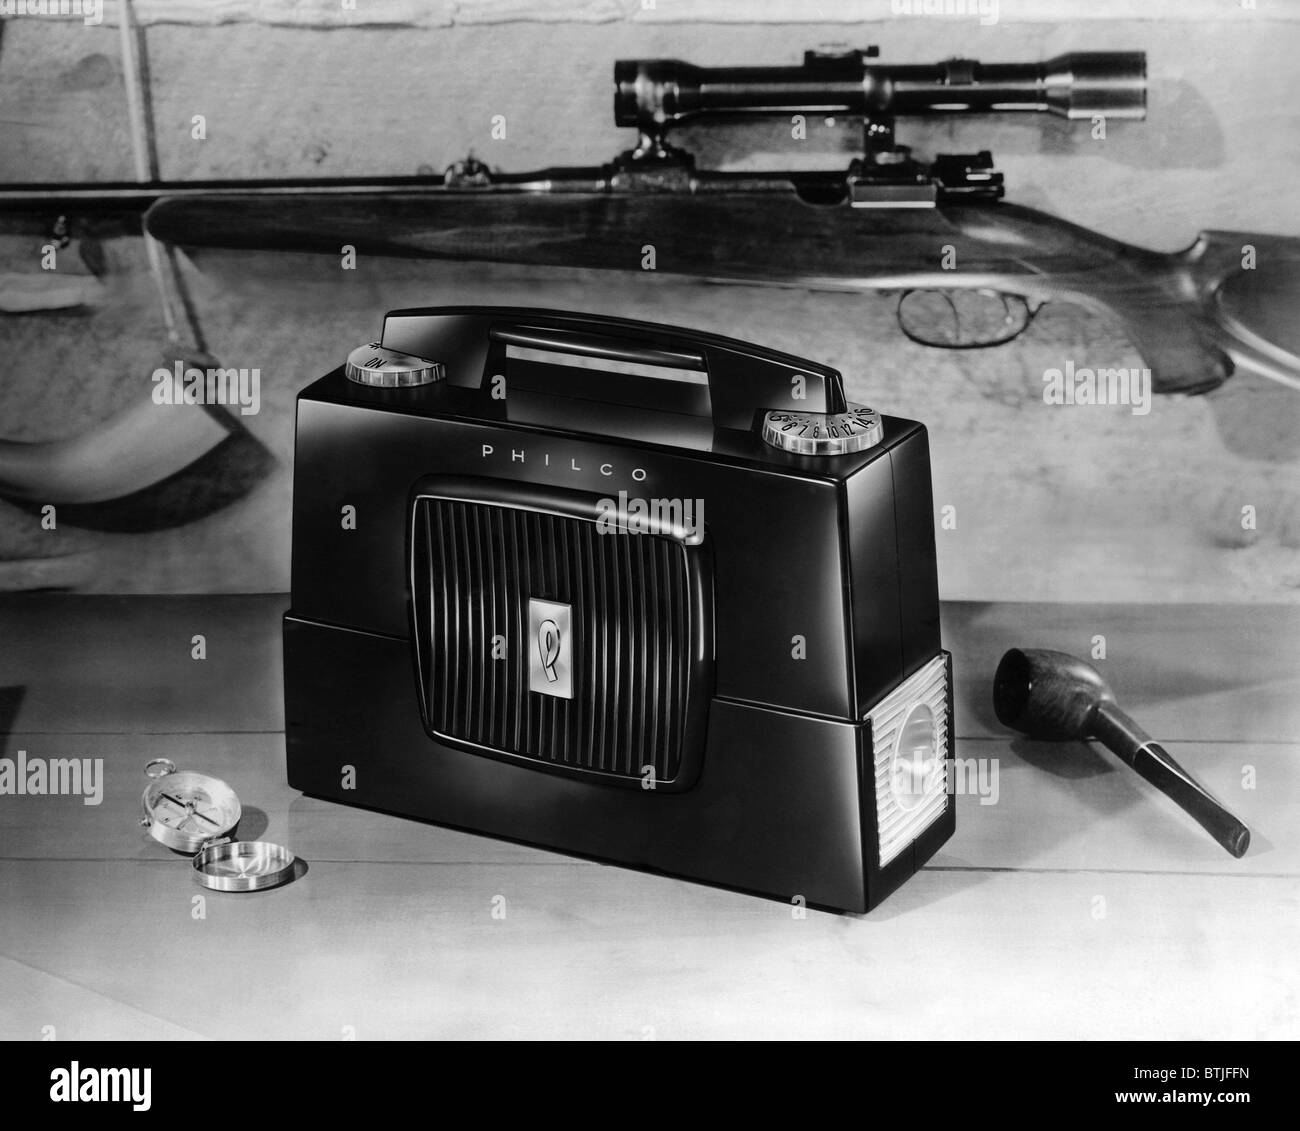 A portable transistor radio, c. 1954. - Stock Image